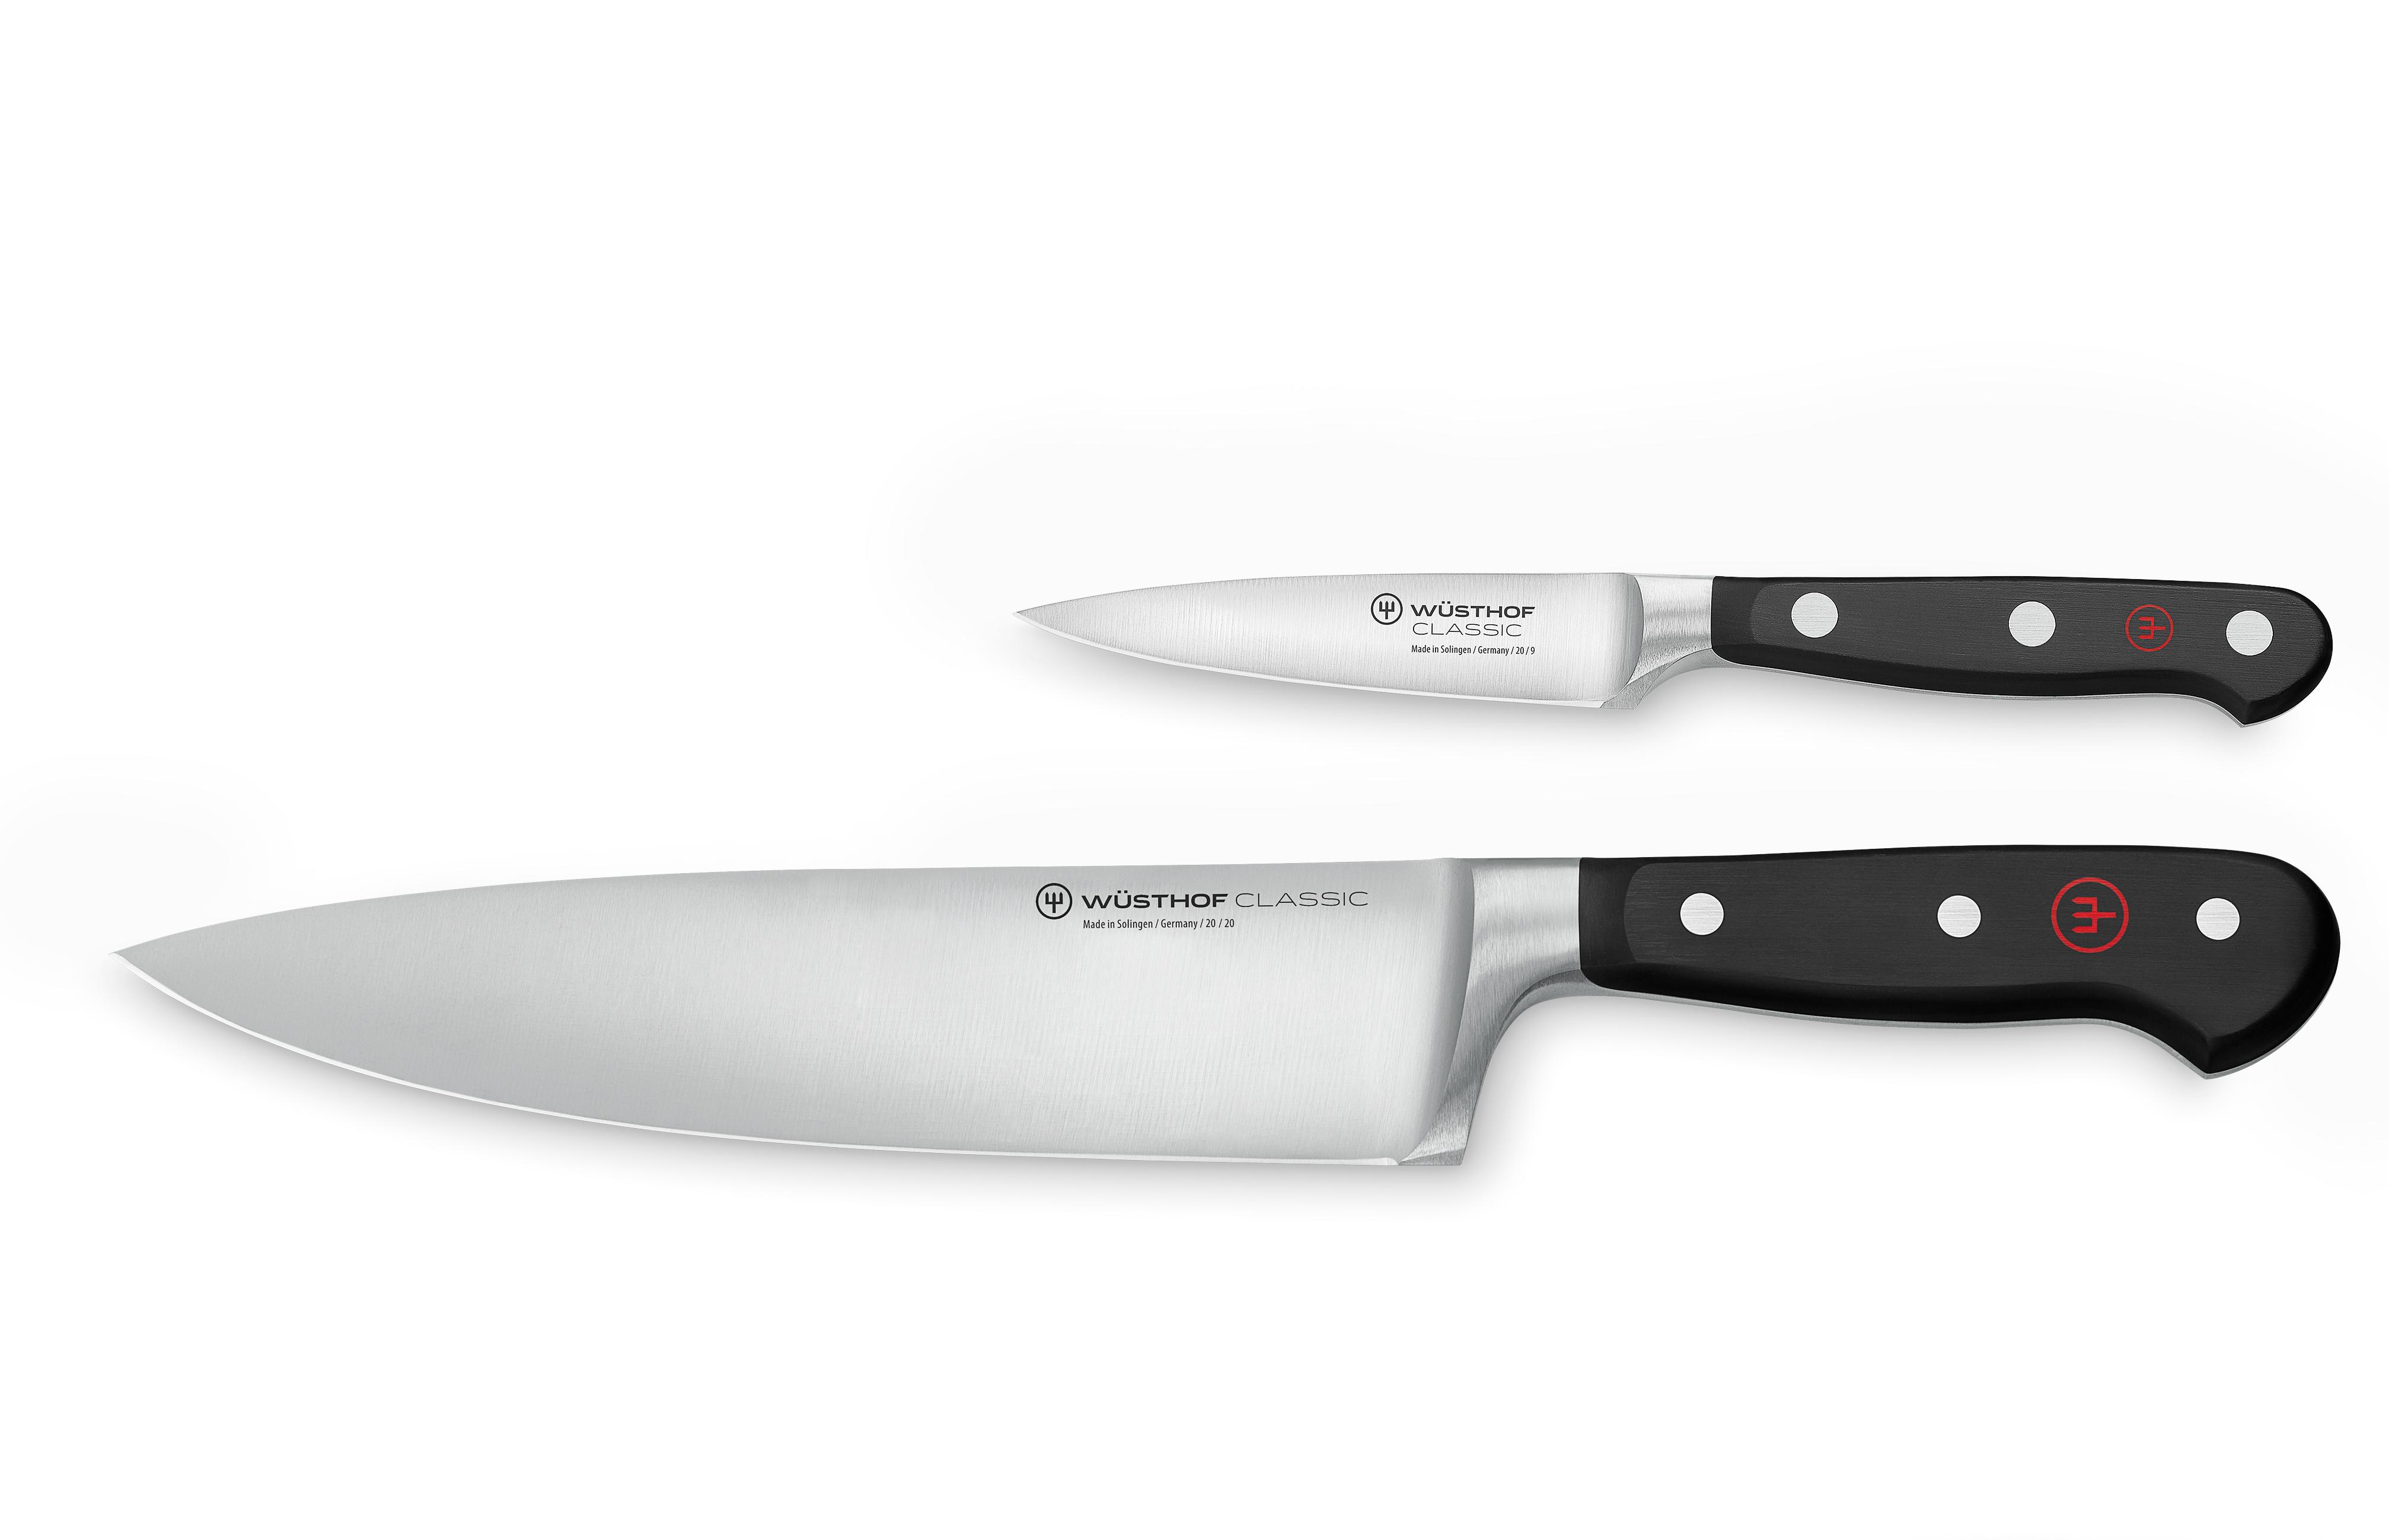 Messer Set mit 2 Messern / Knife set with 2 knives